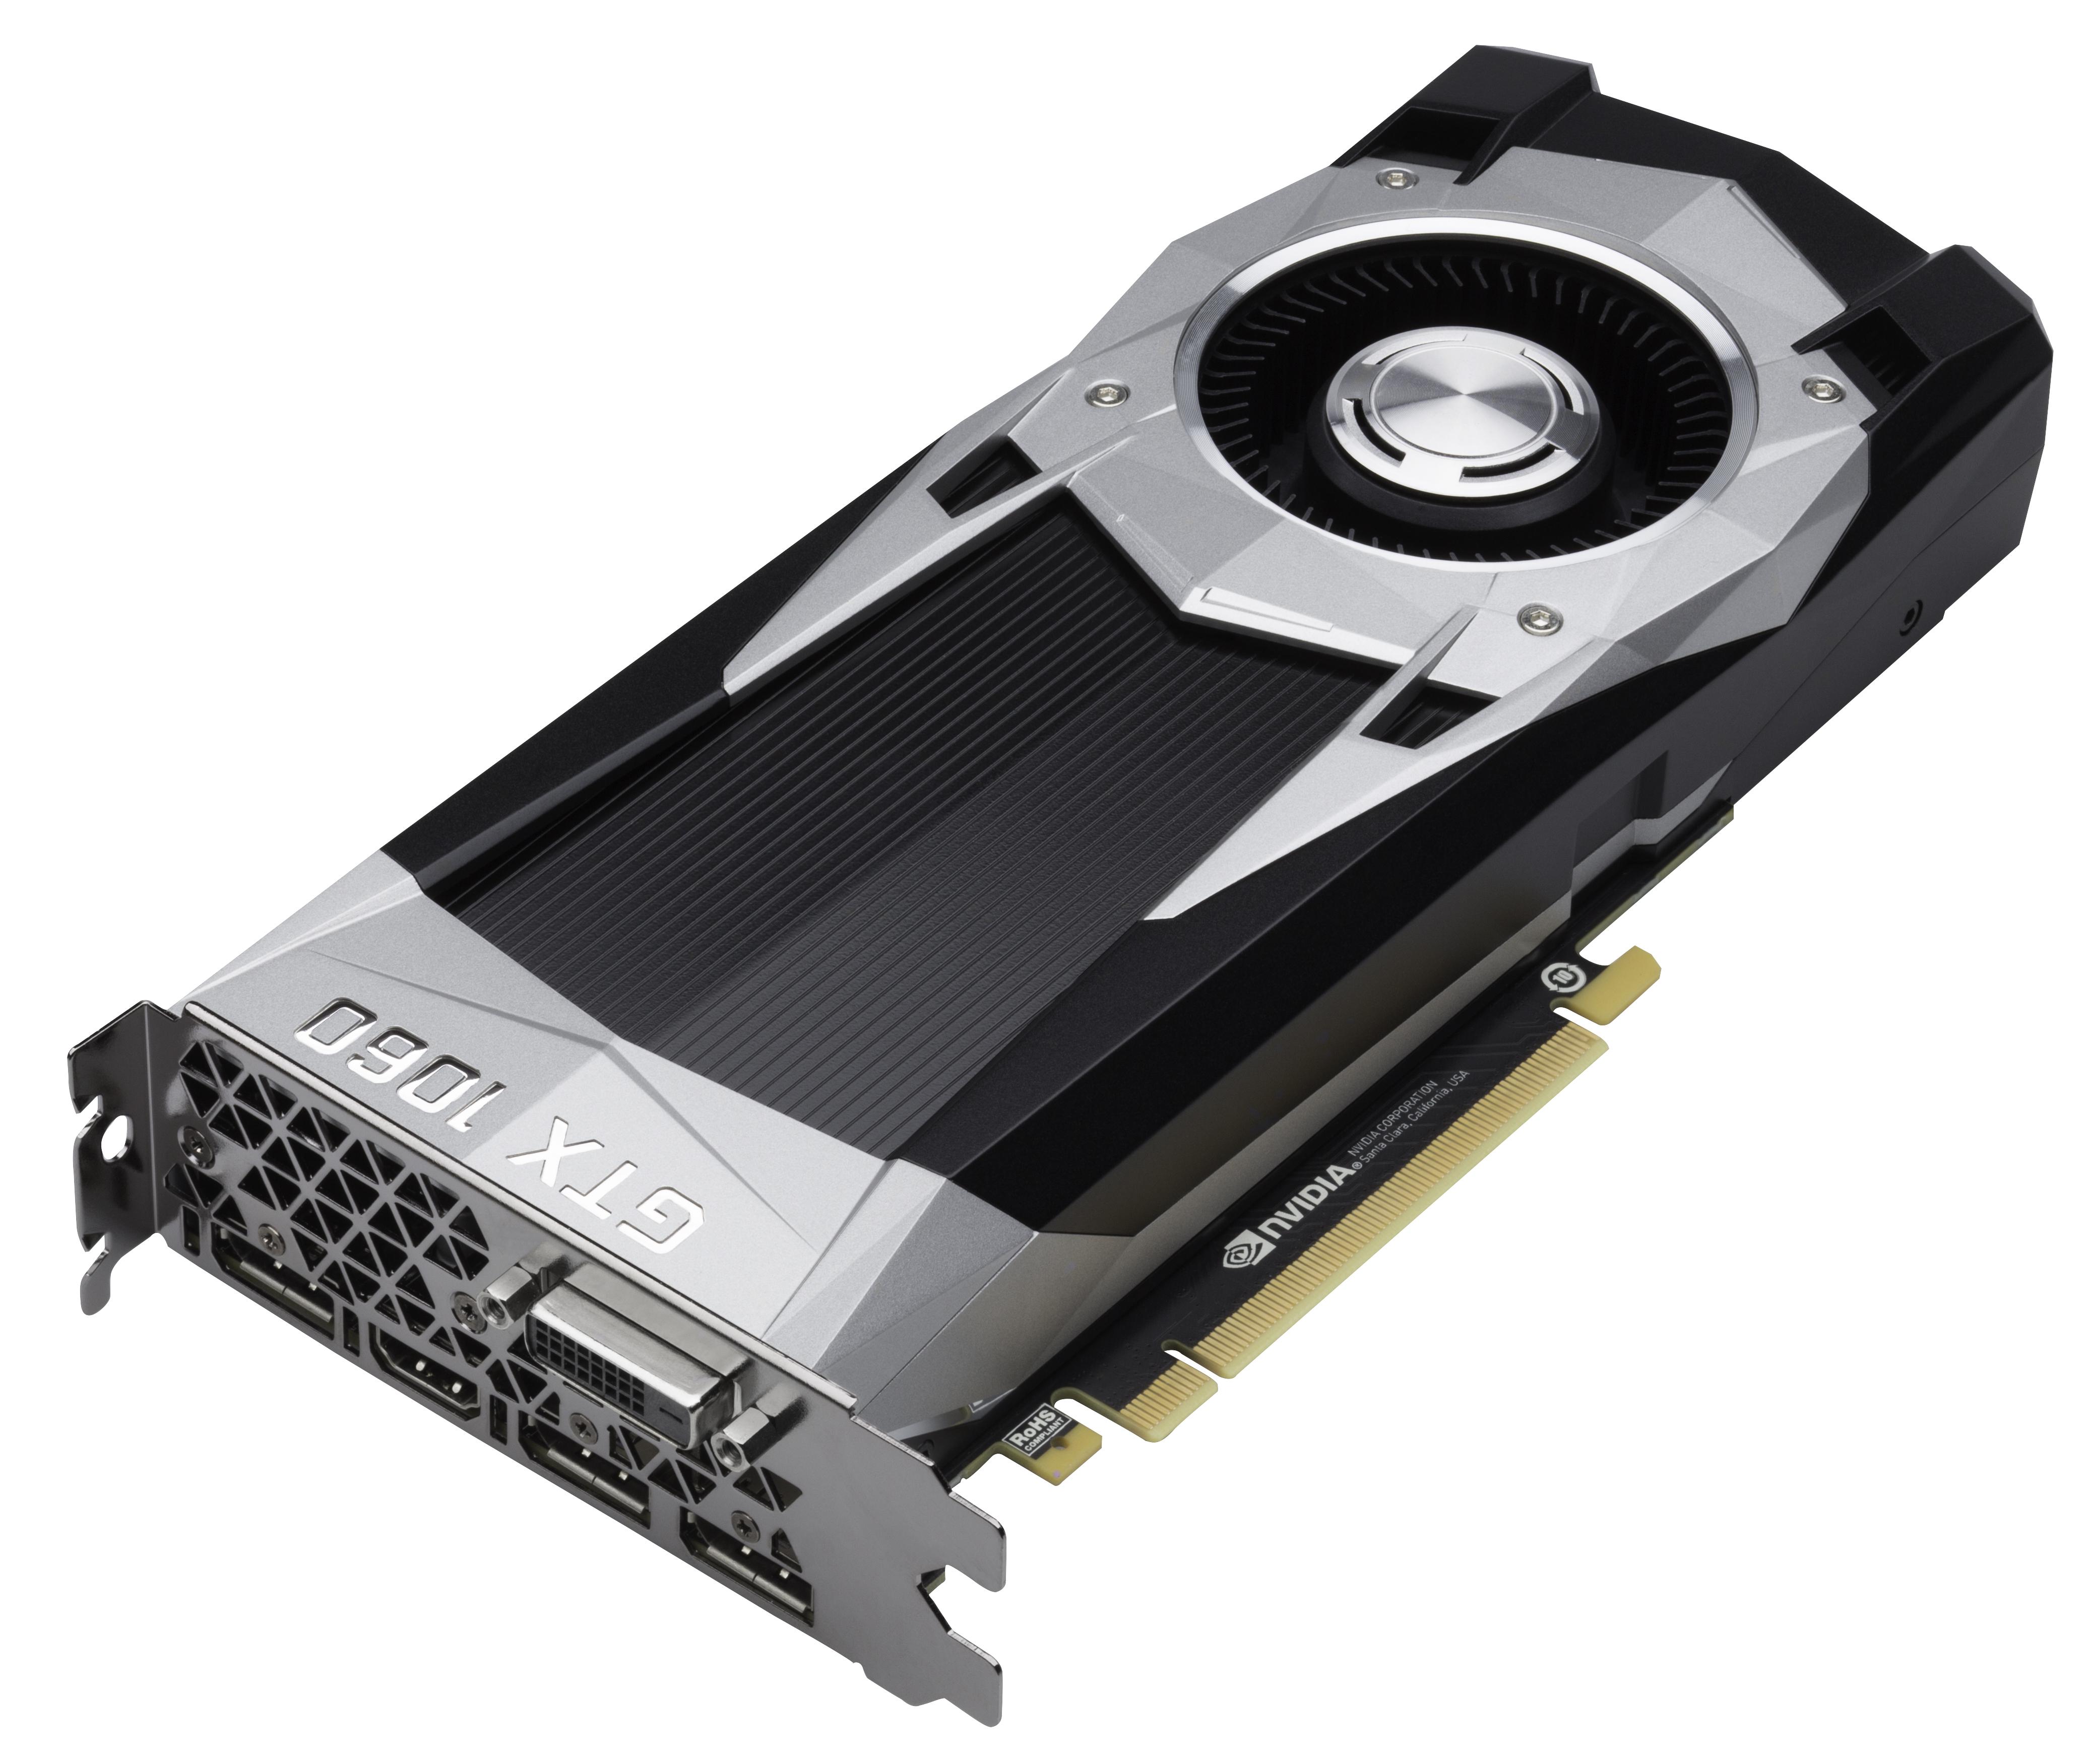 The GeForce GTX 1060 Founders Edition & ASUS Strix GTX 1060